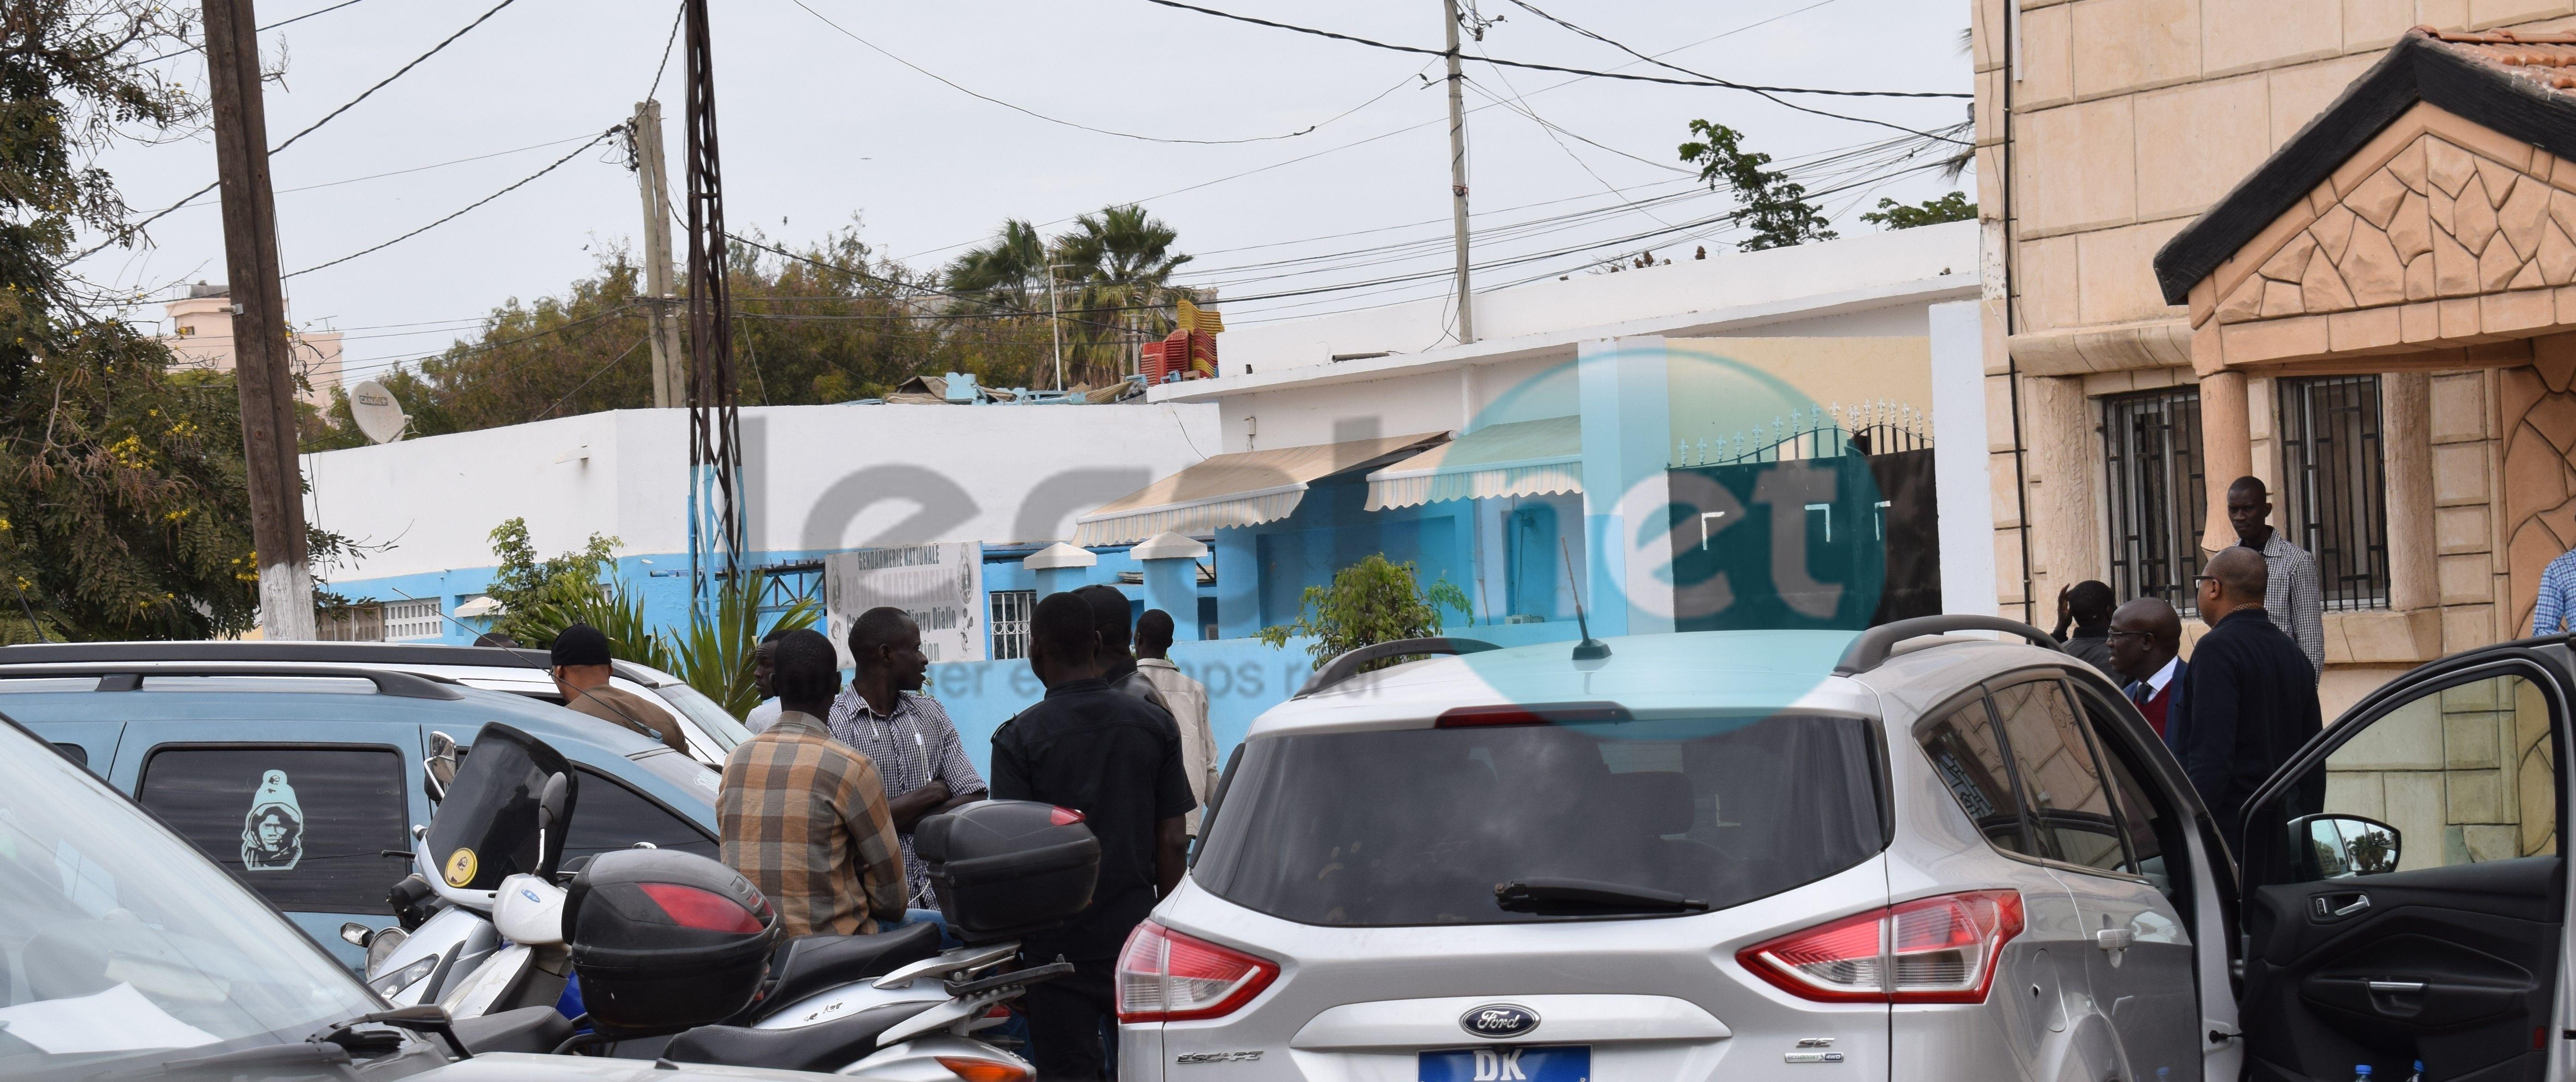 URGENT : El Hadji Diouf relaxé après les présumées menaces de mort sur le frère d'Aminata Tall